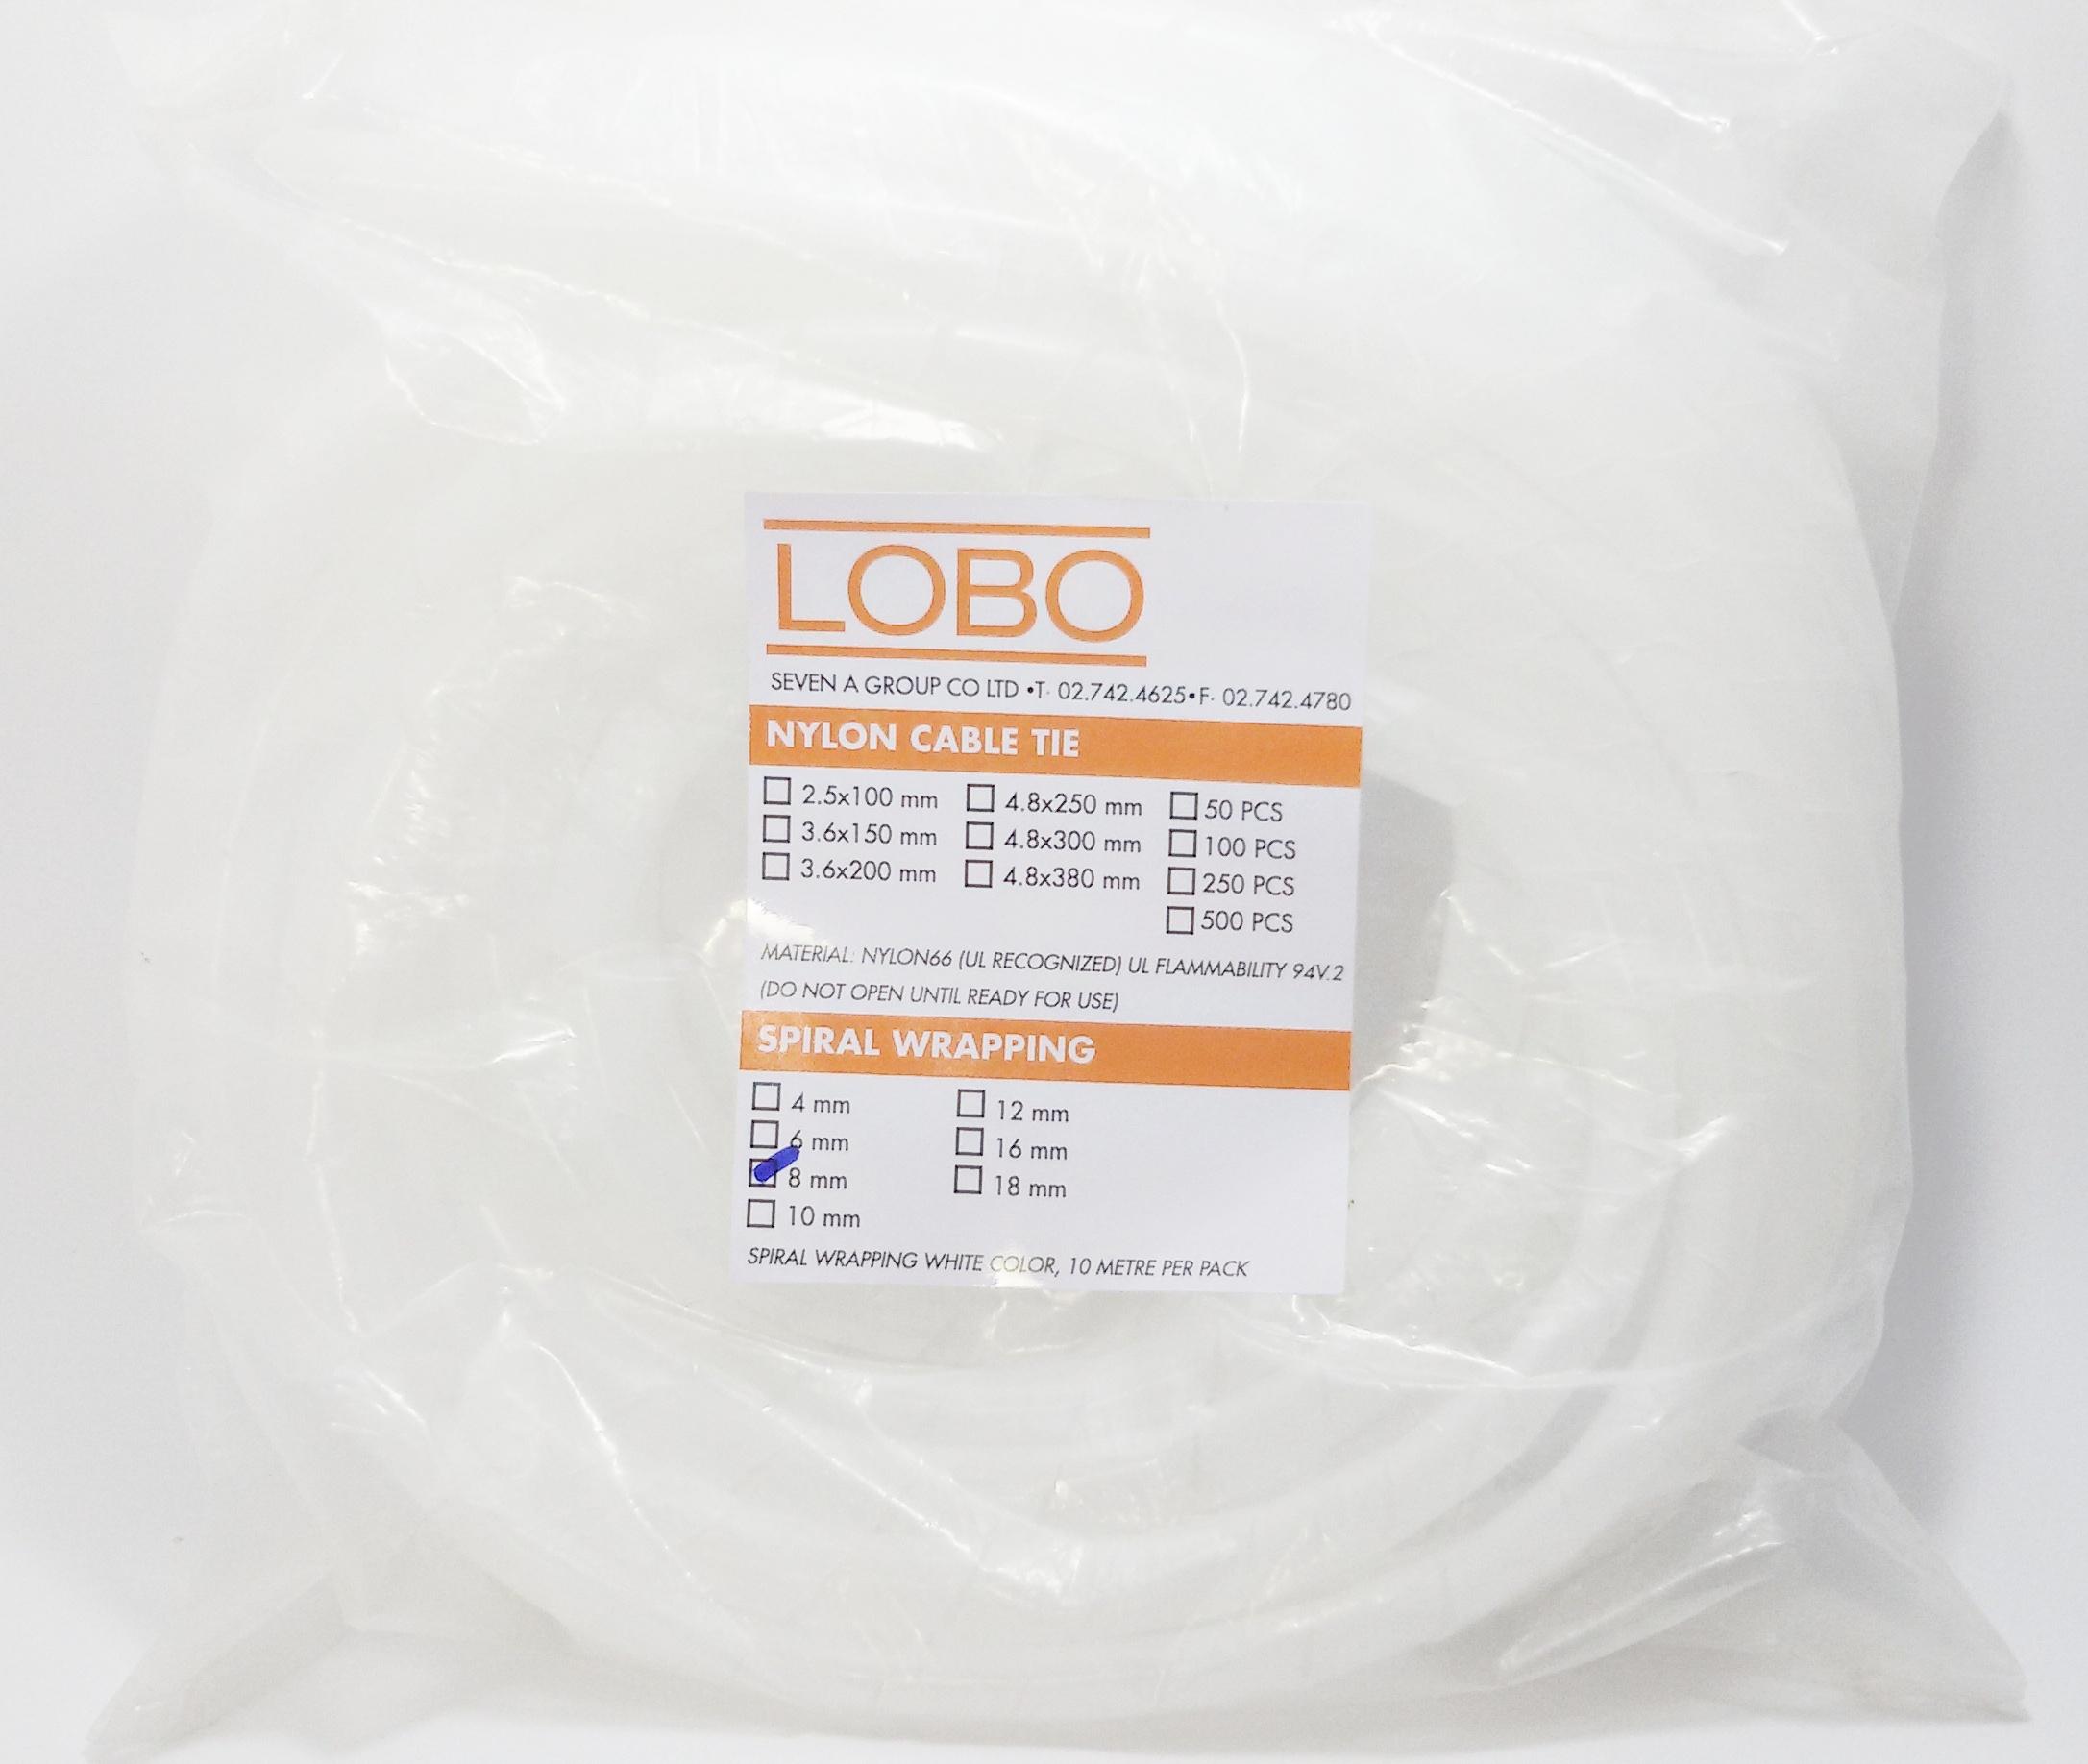 LOBO SPIRAL WRAPPING 8 mm ( ไส้ไก่เก็บสายไฟ )